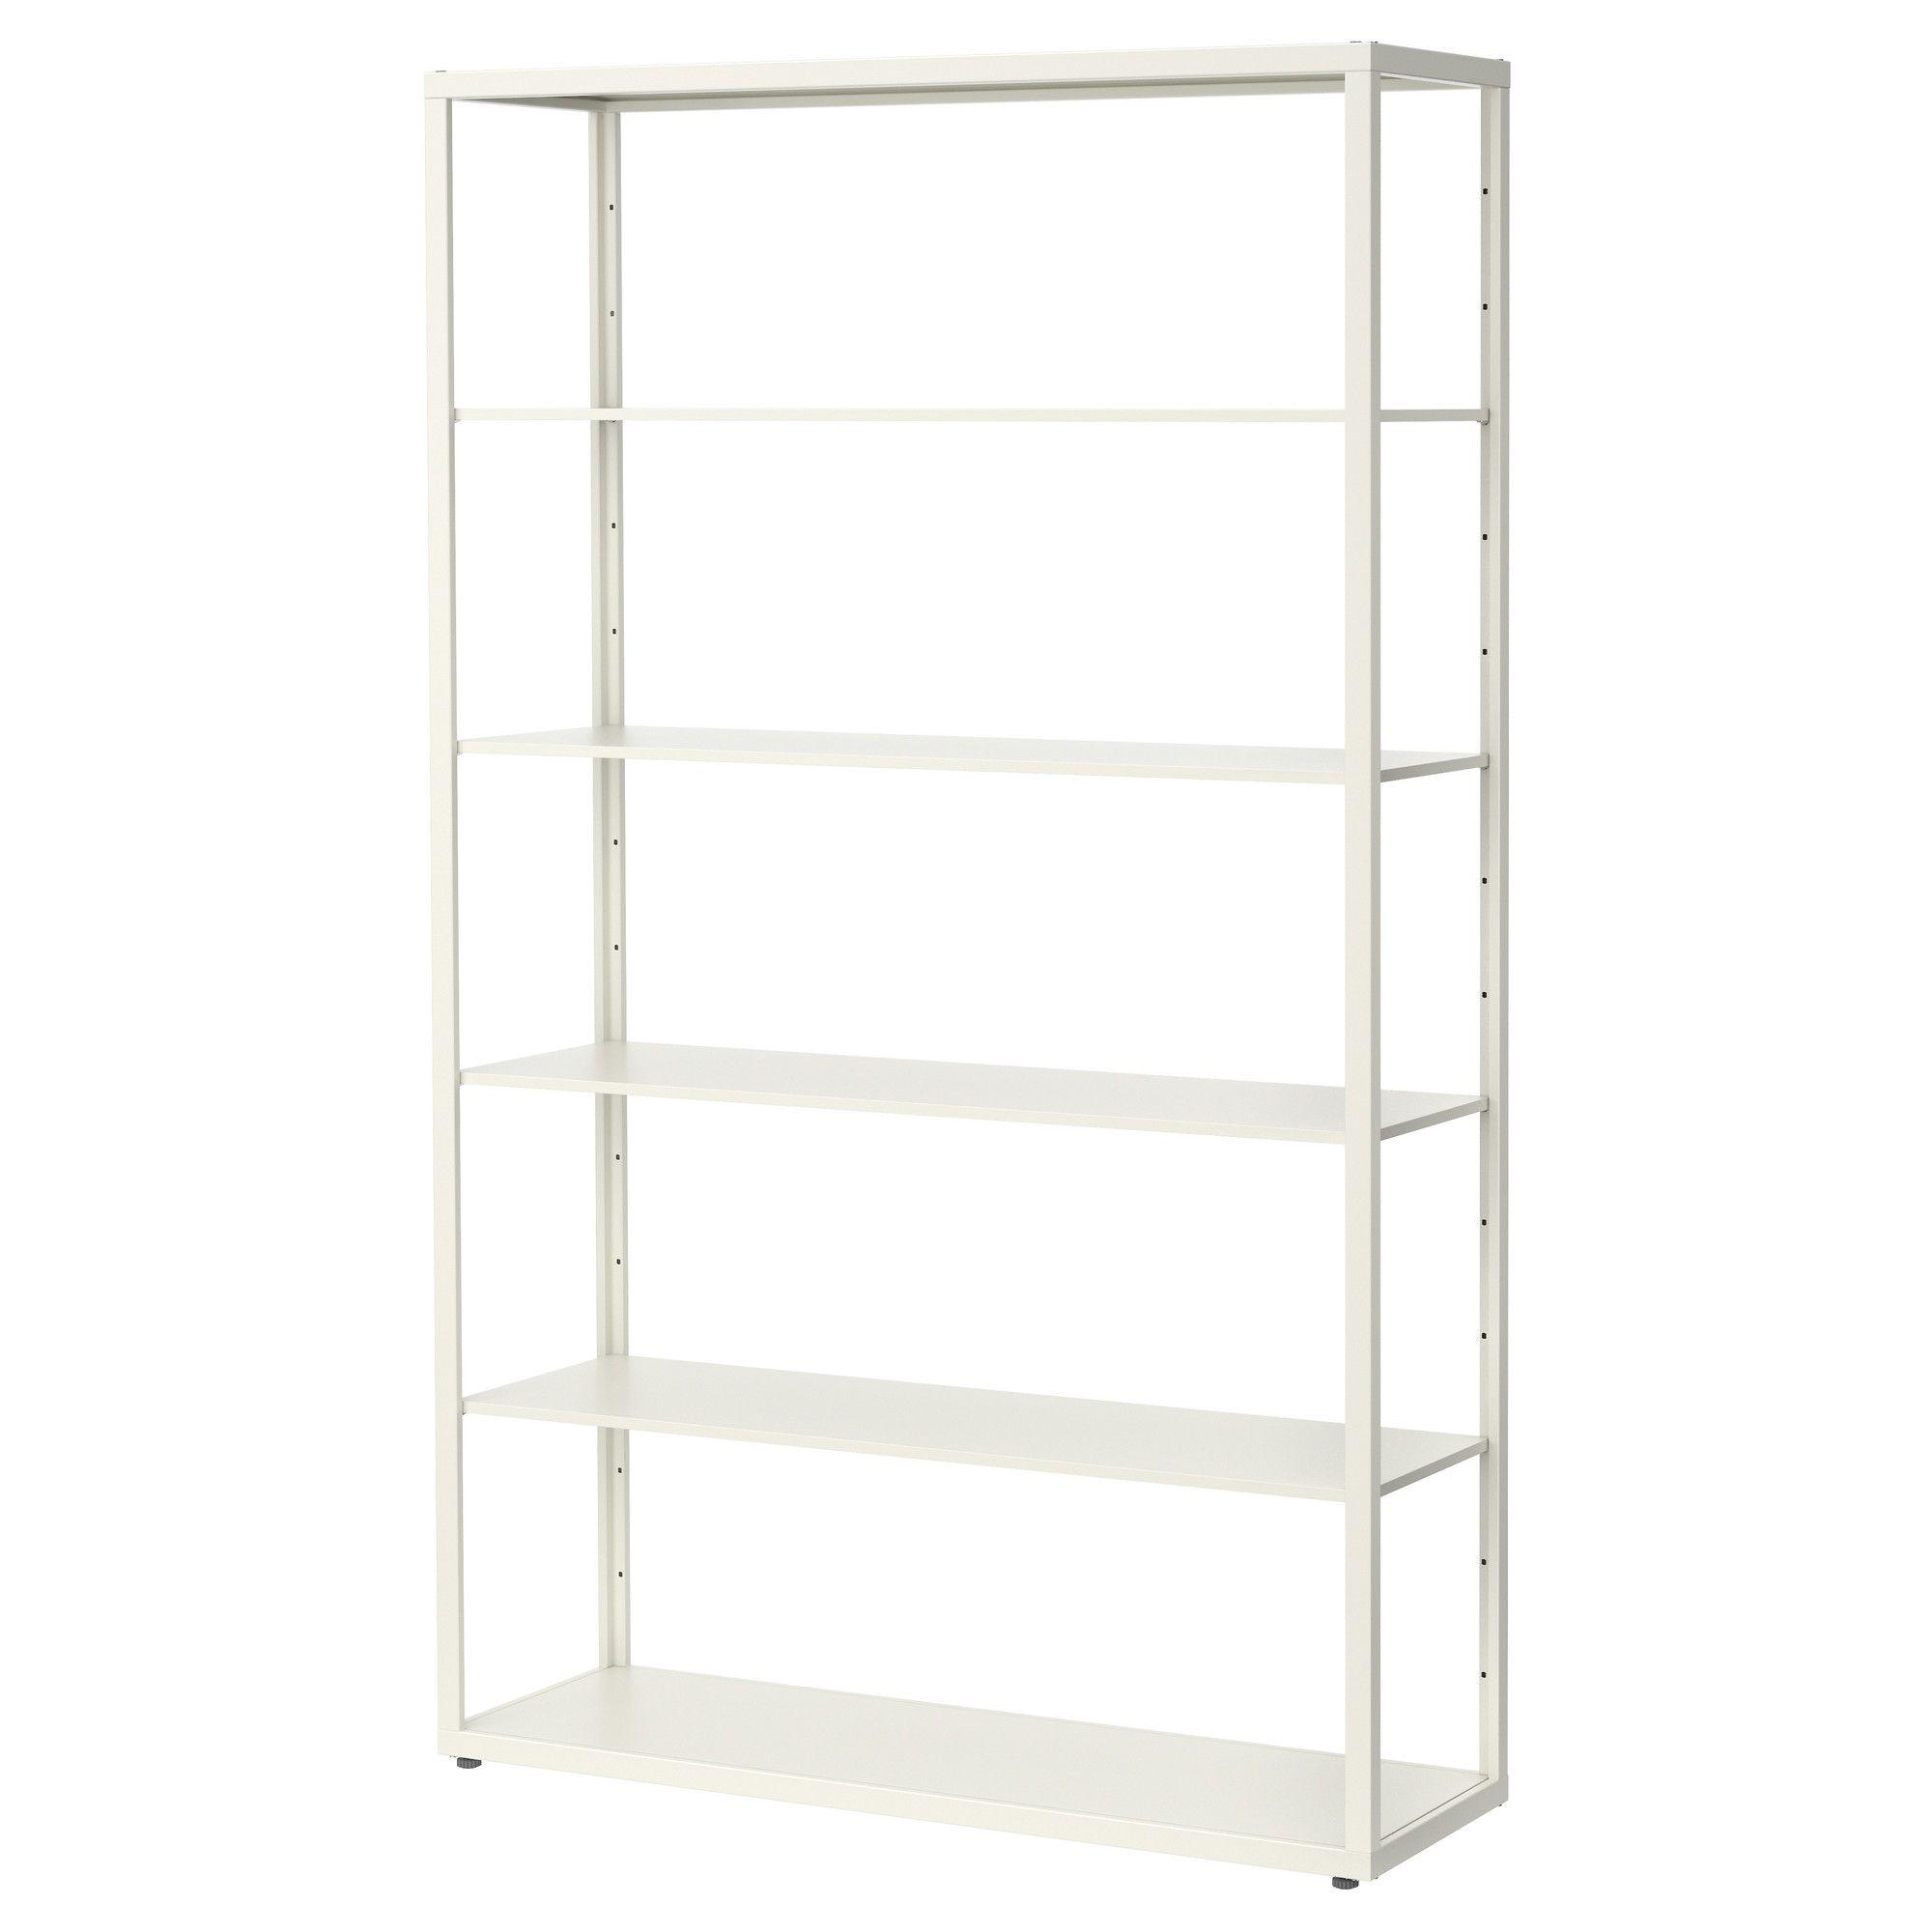 Simple Clean Shelving Fjalkinge Shelf Unit Ikea Ikea Shelving